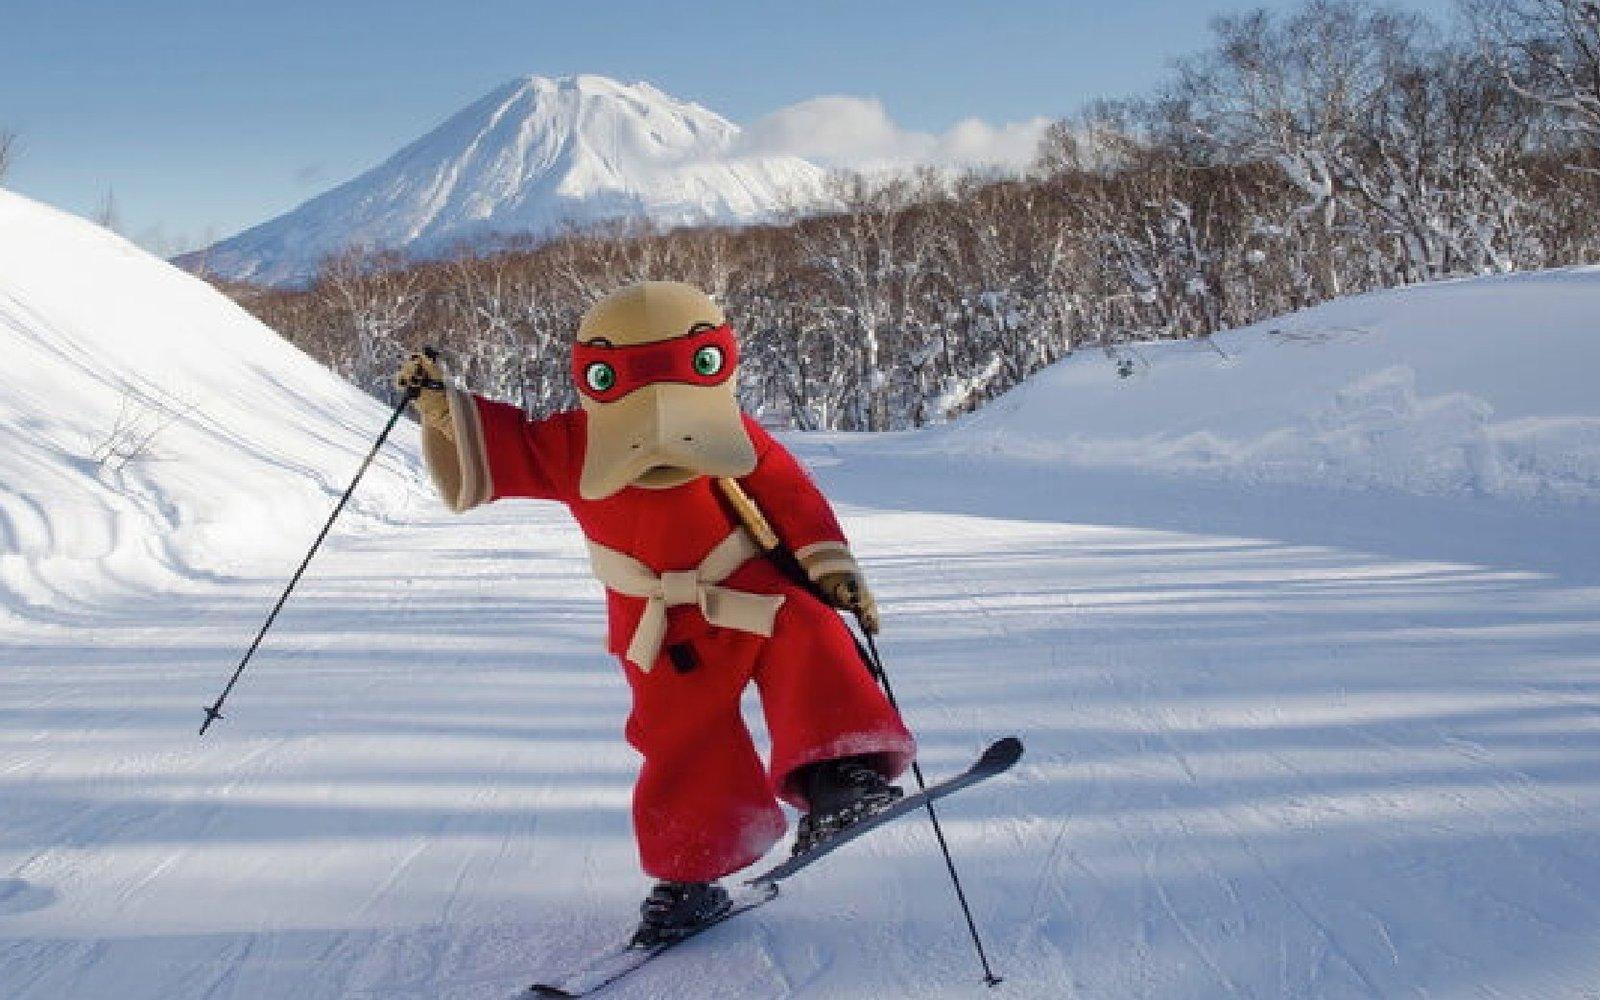 kamonohashi is the platypus samurai mascot for hanazono niseko japan